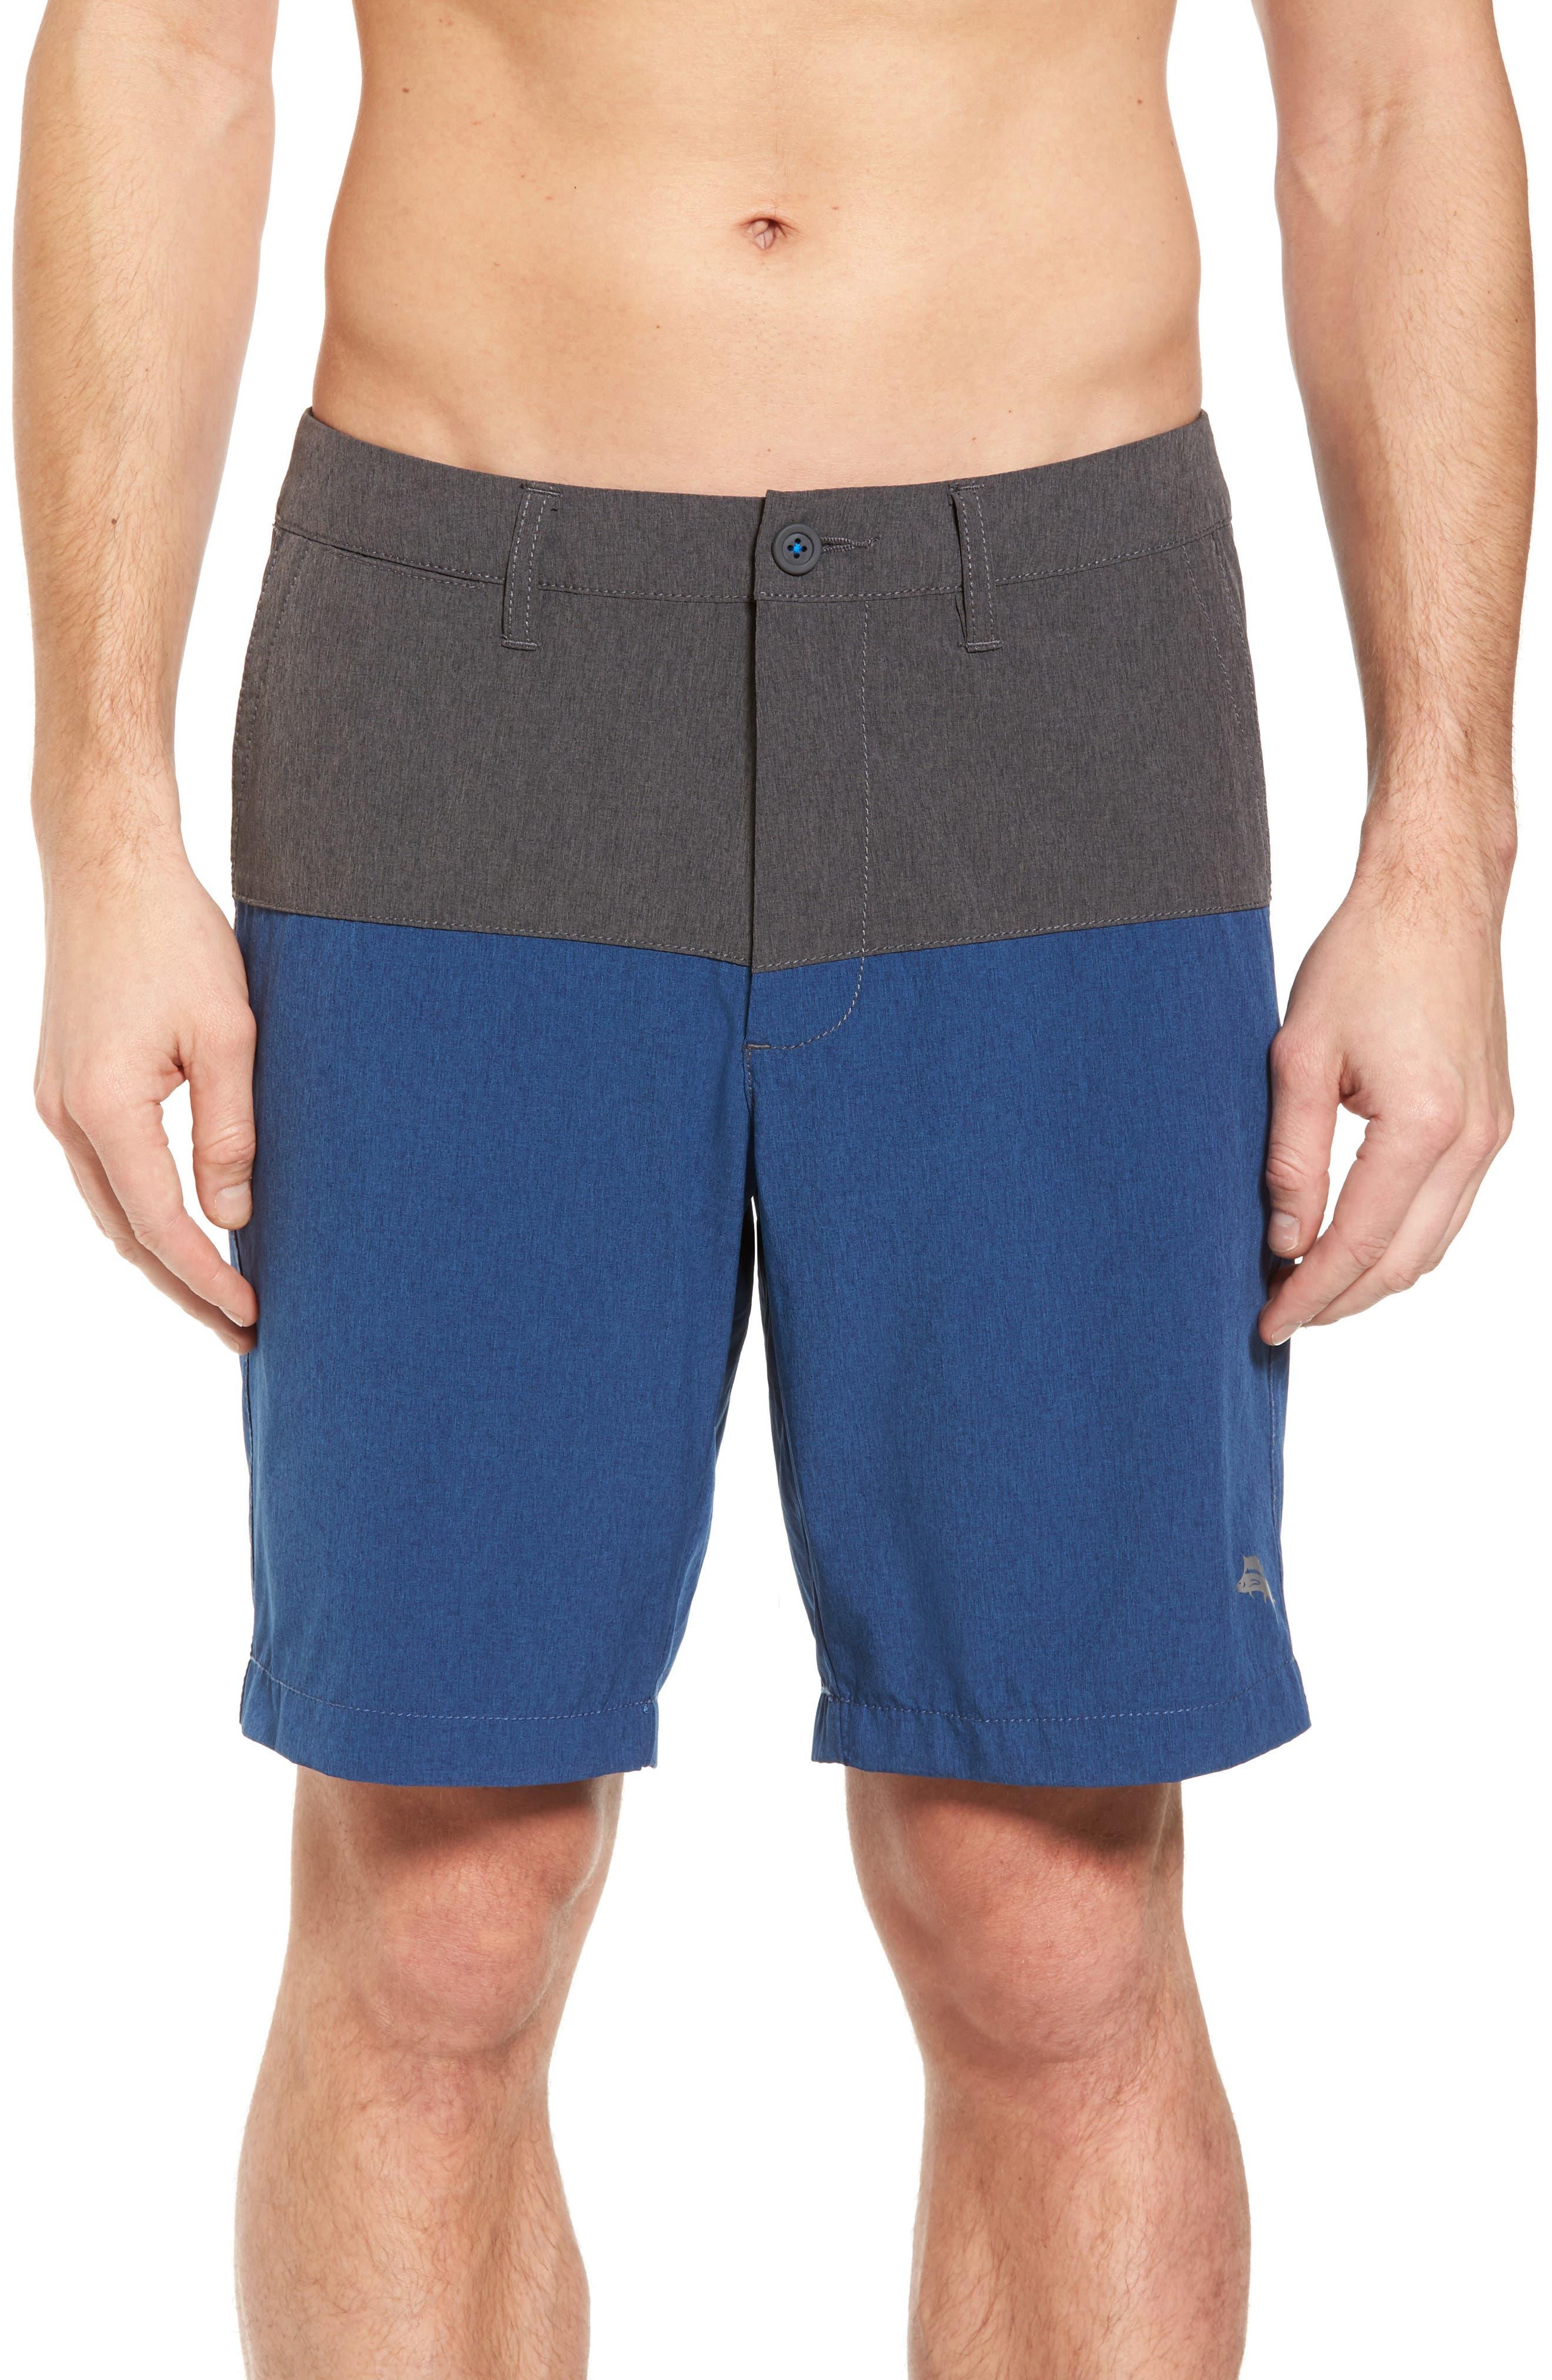 Cayman Block & Roll Hybrid Swim Shorts,                         Main,                         color, Deep Marine